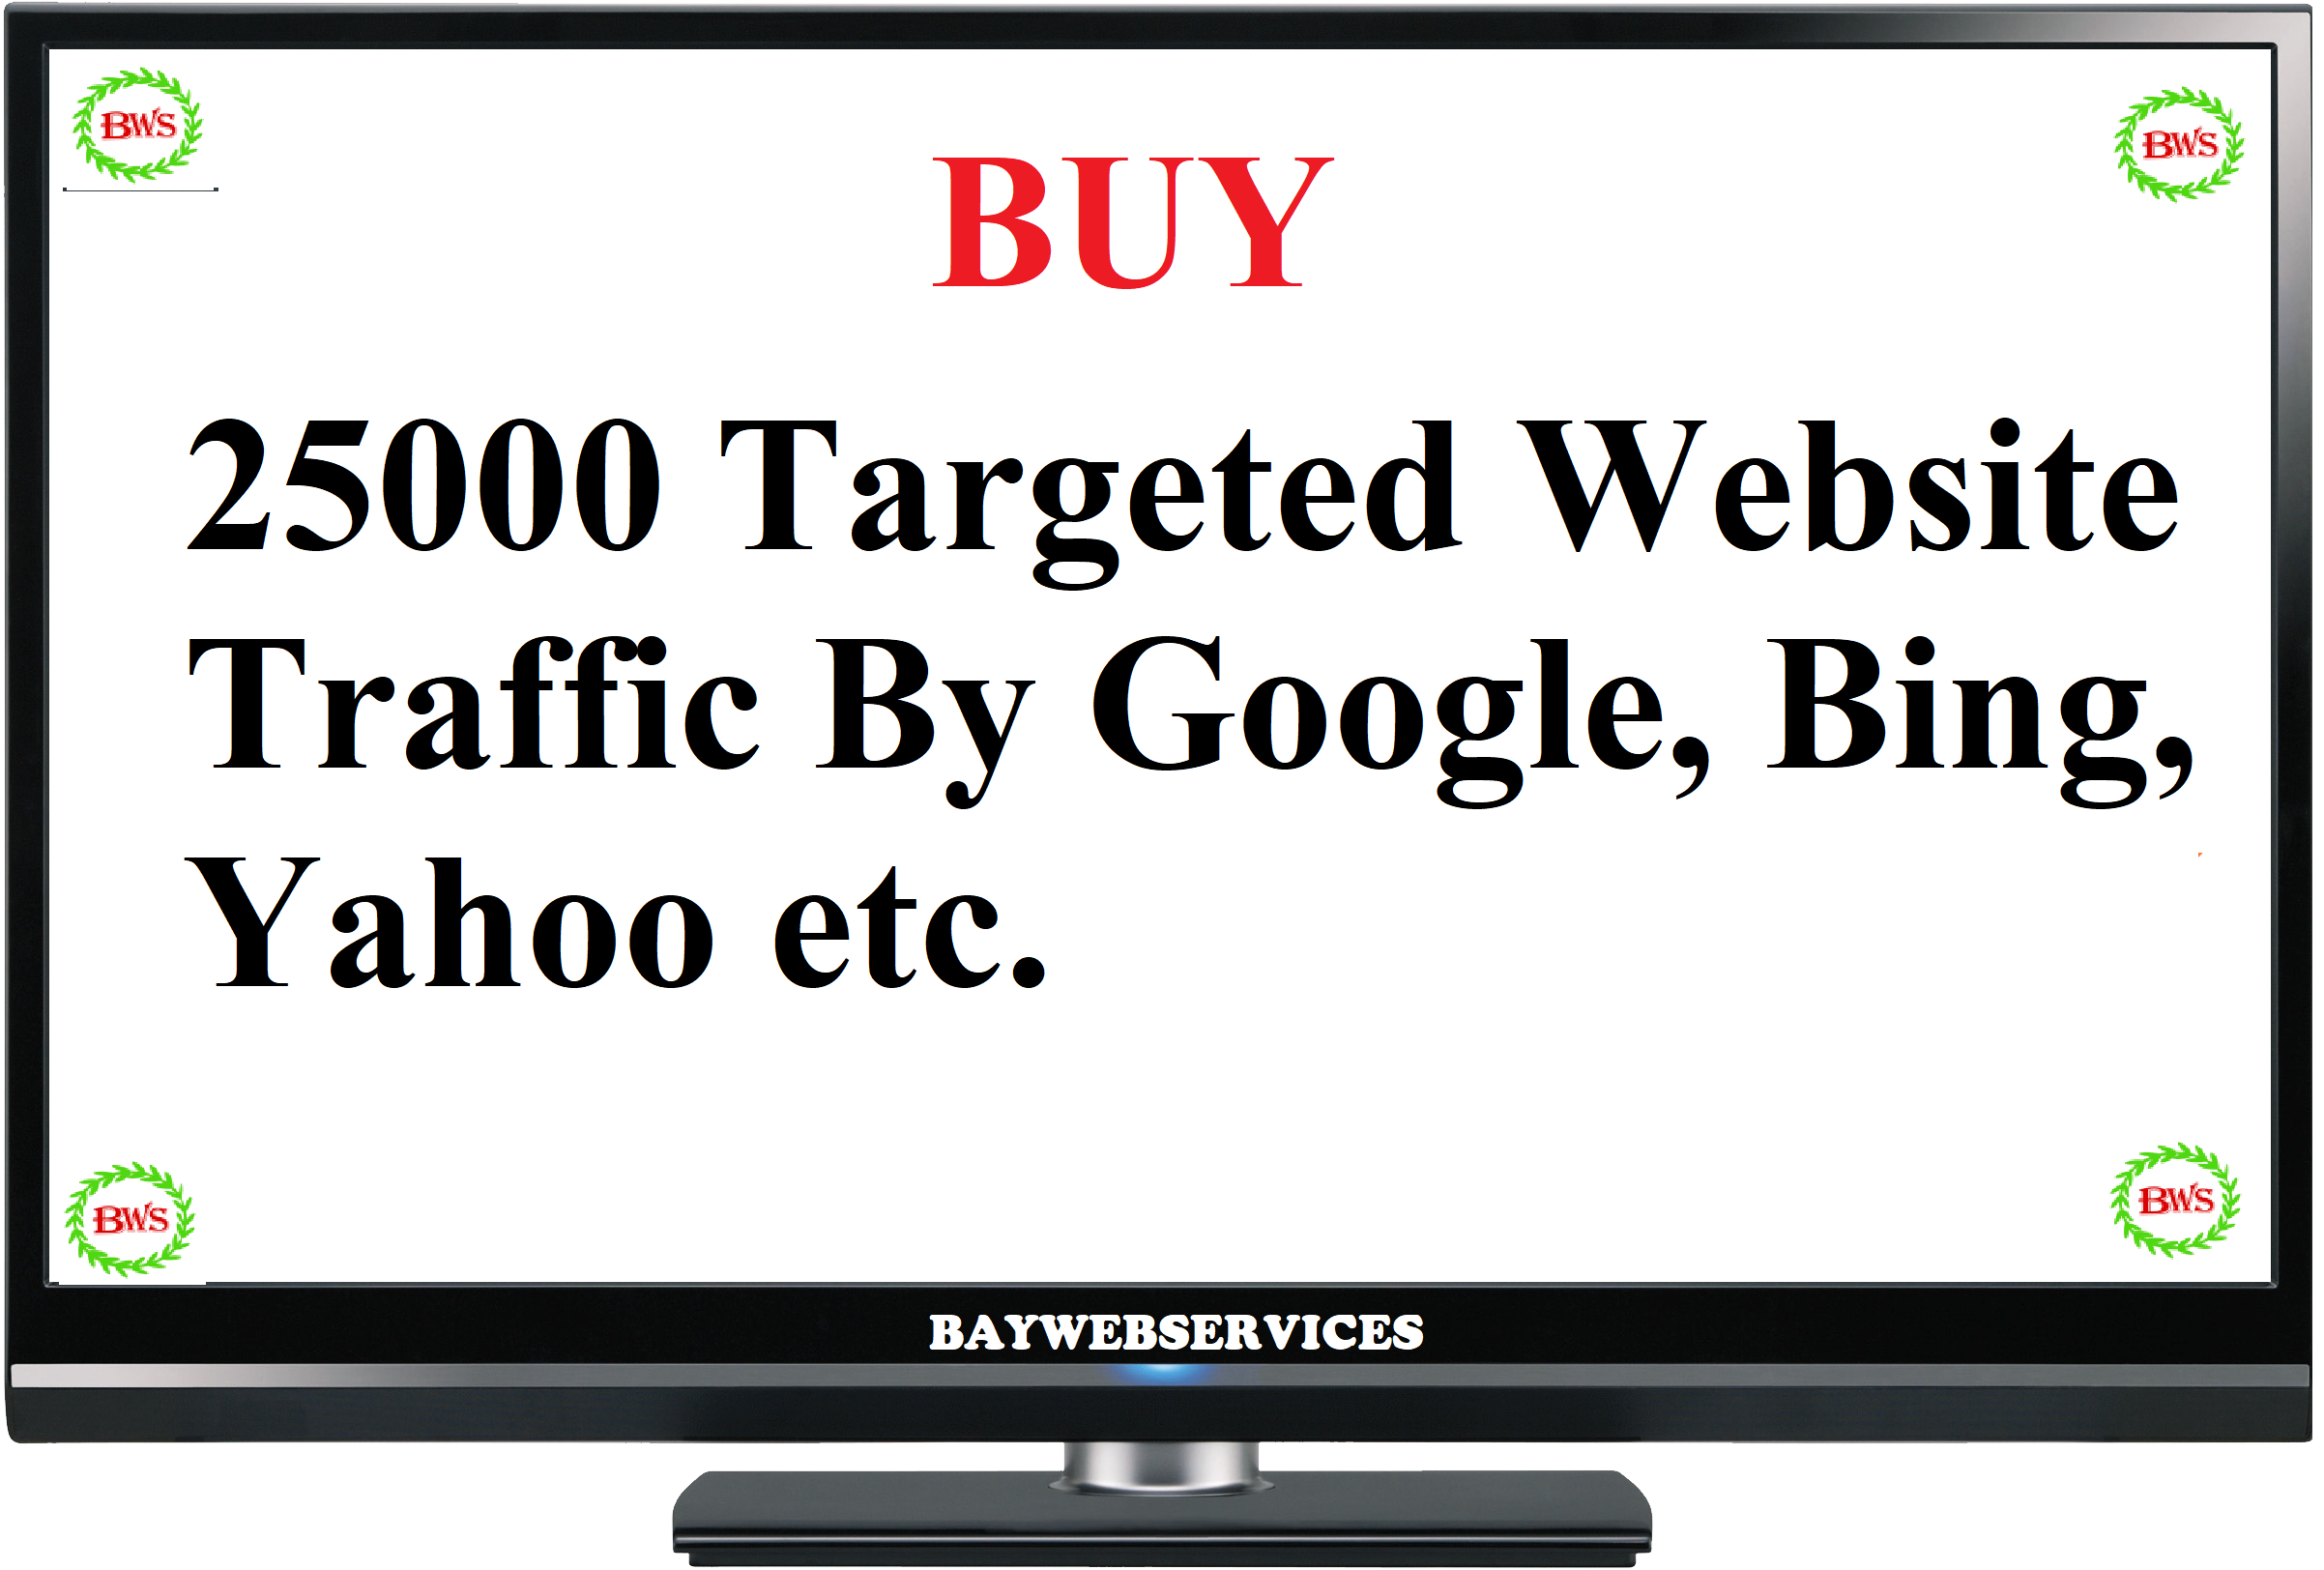 Drive 25000 USA Website Traffic From Google, Bing, Yahoo etc.